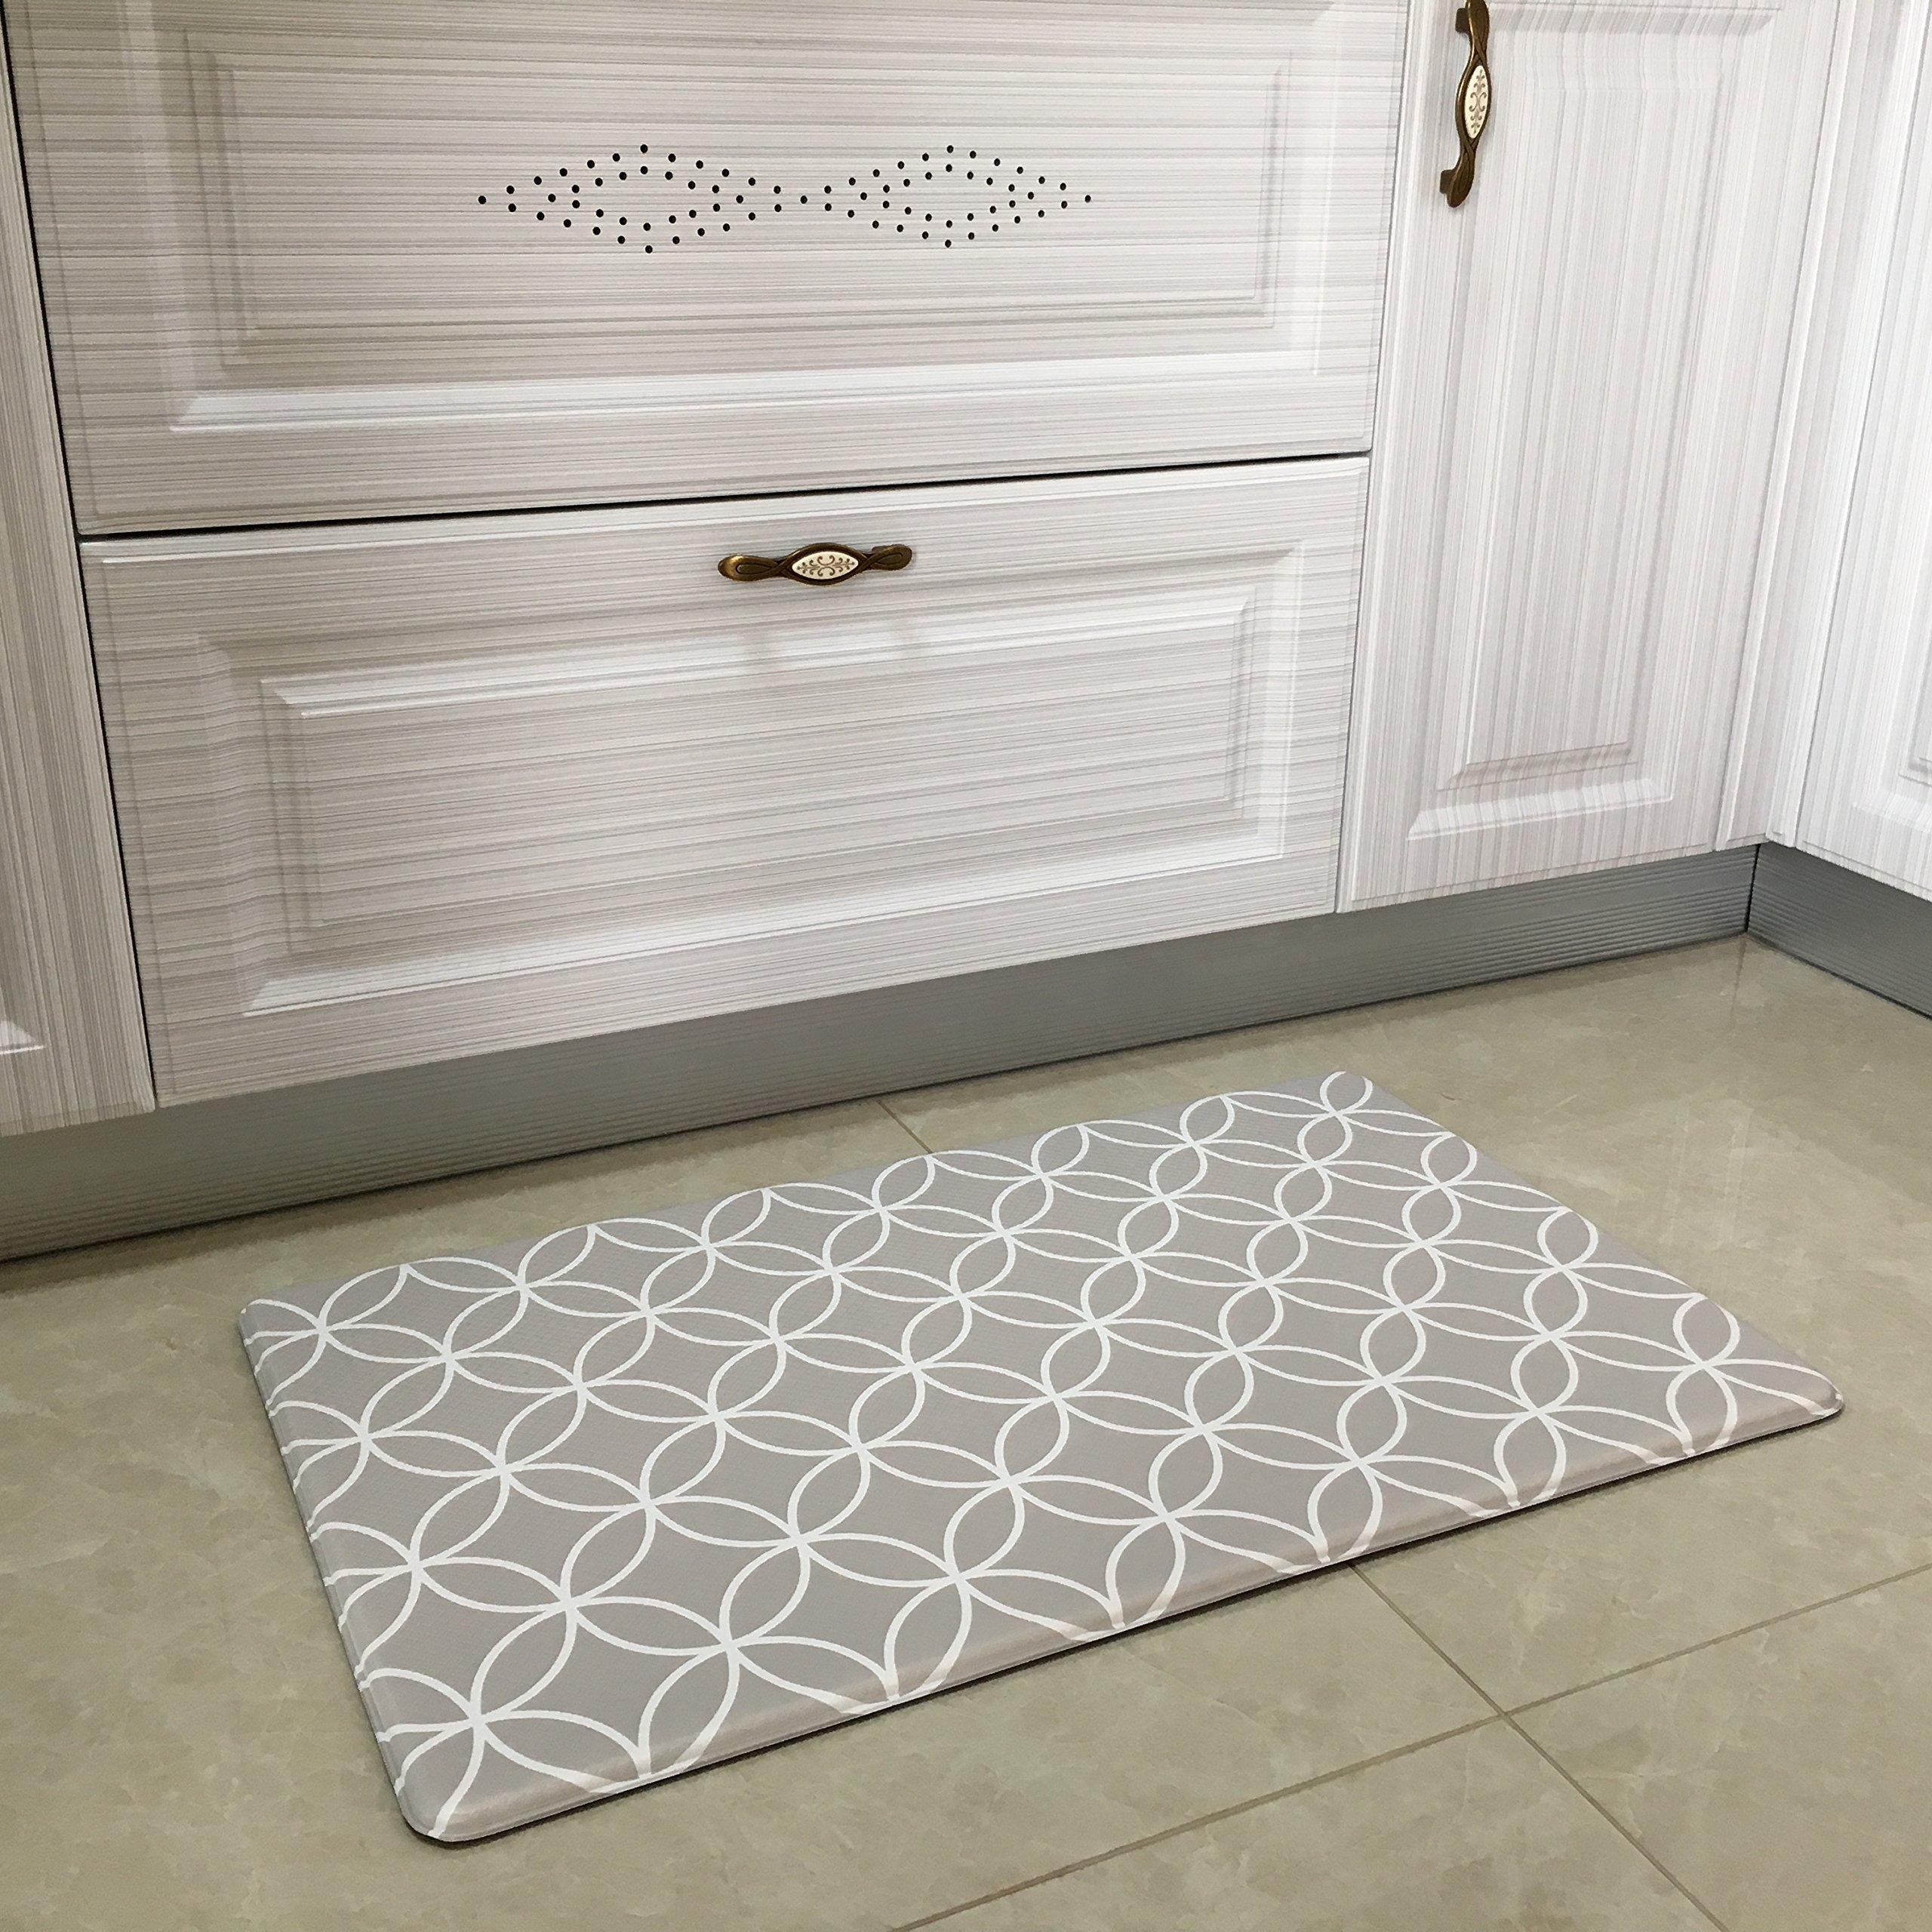 Art3d Premium Kitchen/Office Comfort Standing Mat Comfort Kitchen Rug, 18'' W X 30'' L by Art3d (Image #3)